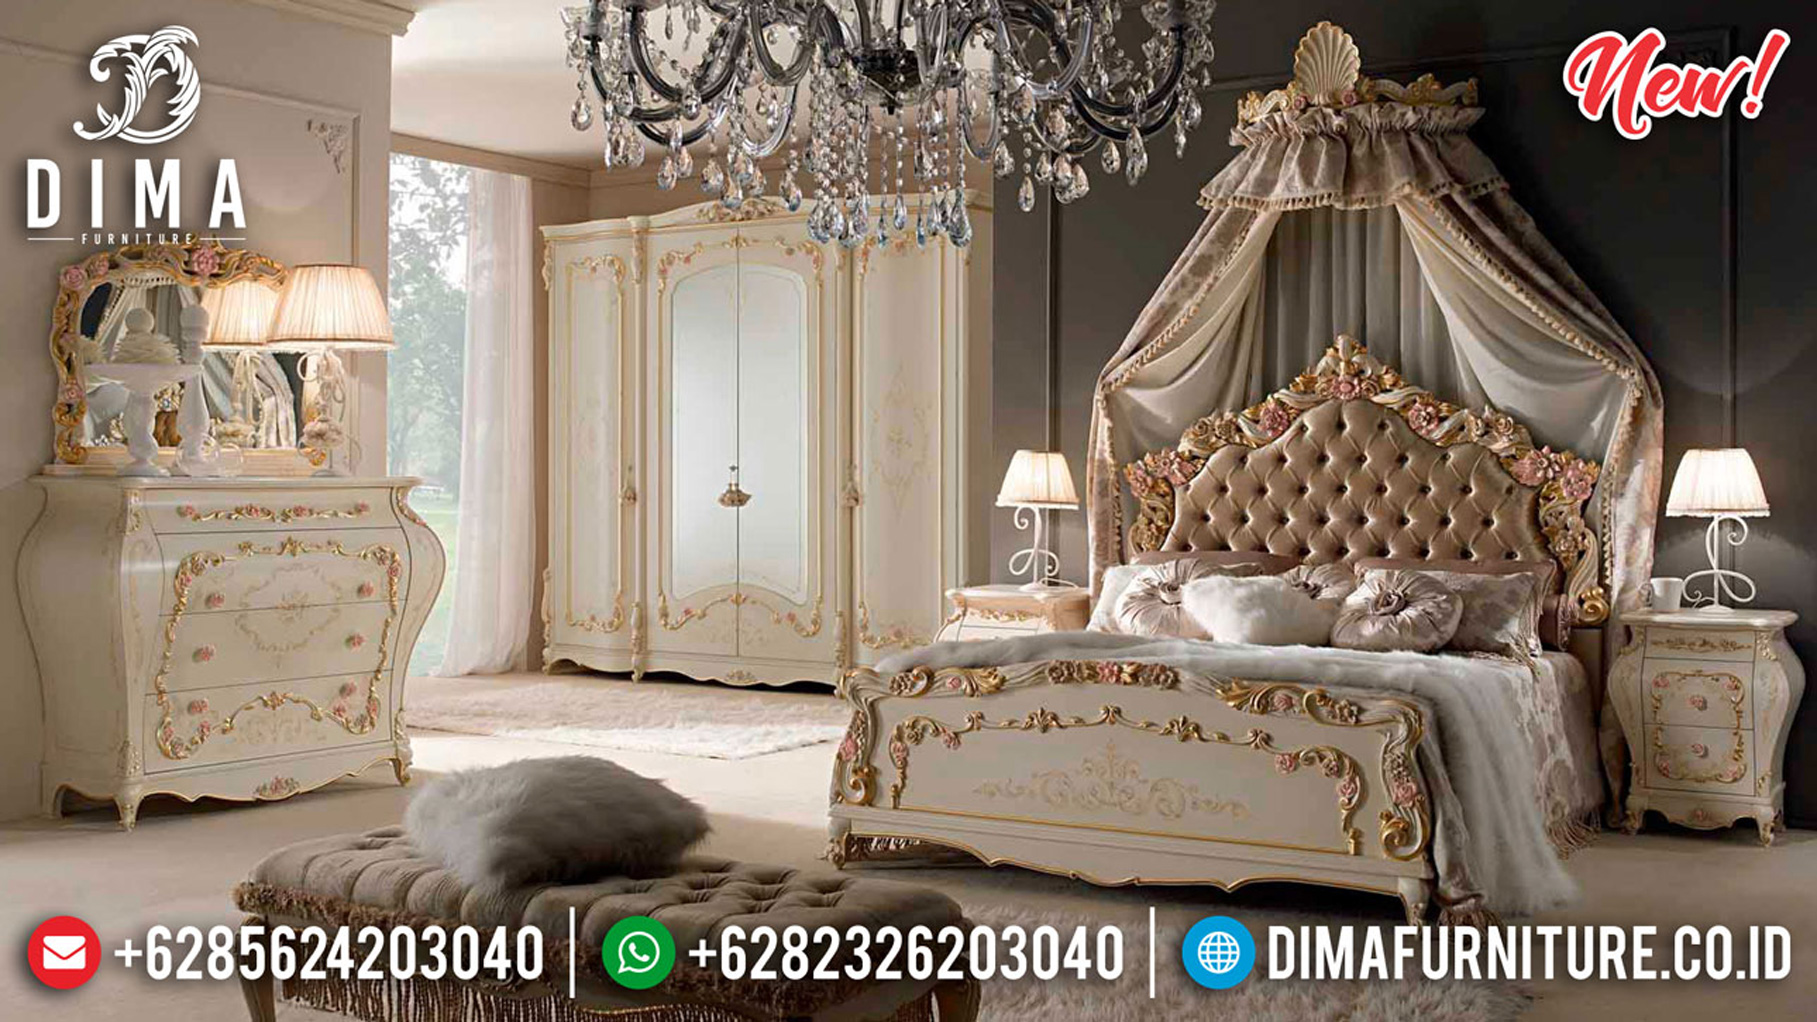 Harga Kamar Set Mewah Jepara Terbaru Luxury Classic Best Collection ST-1177